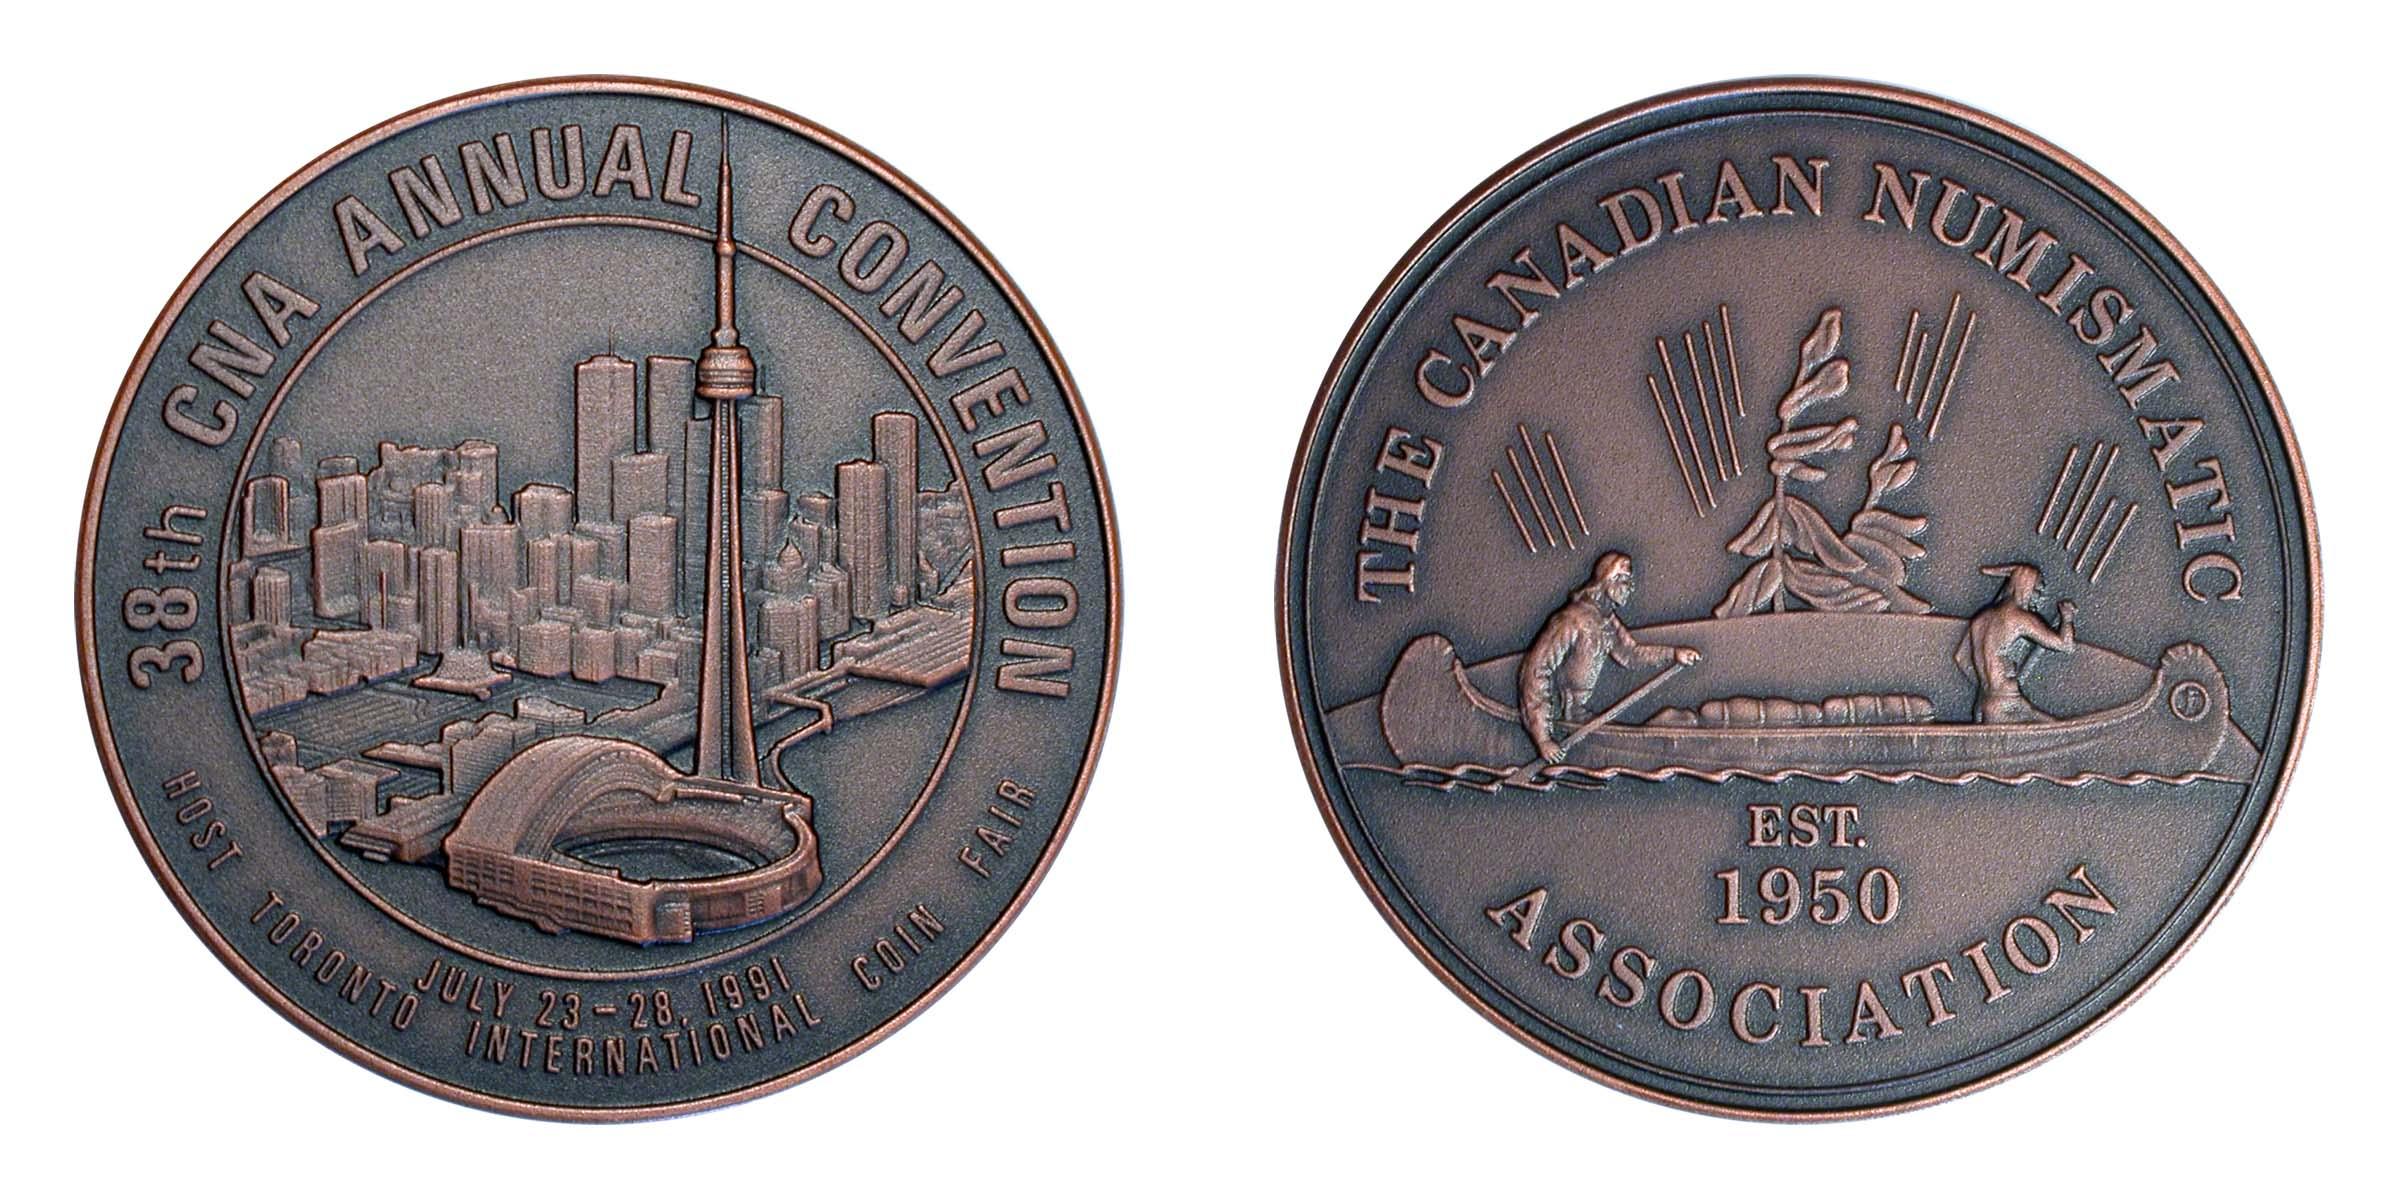 1991 C.N.A. Toronto